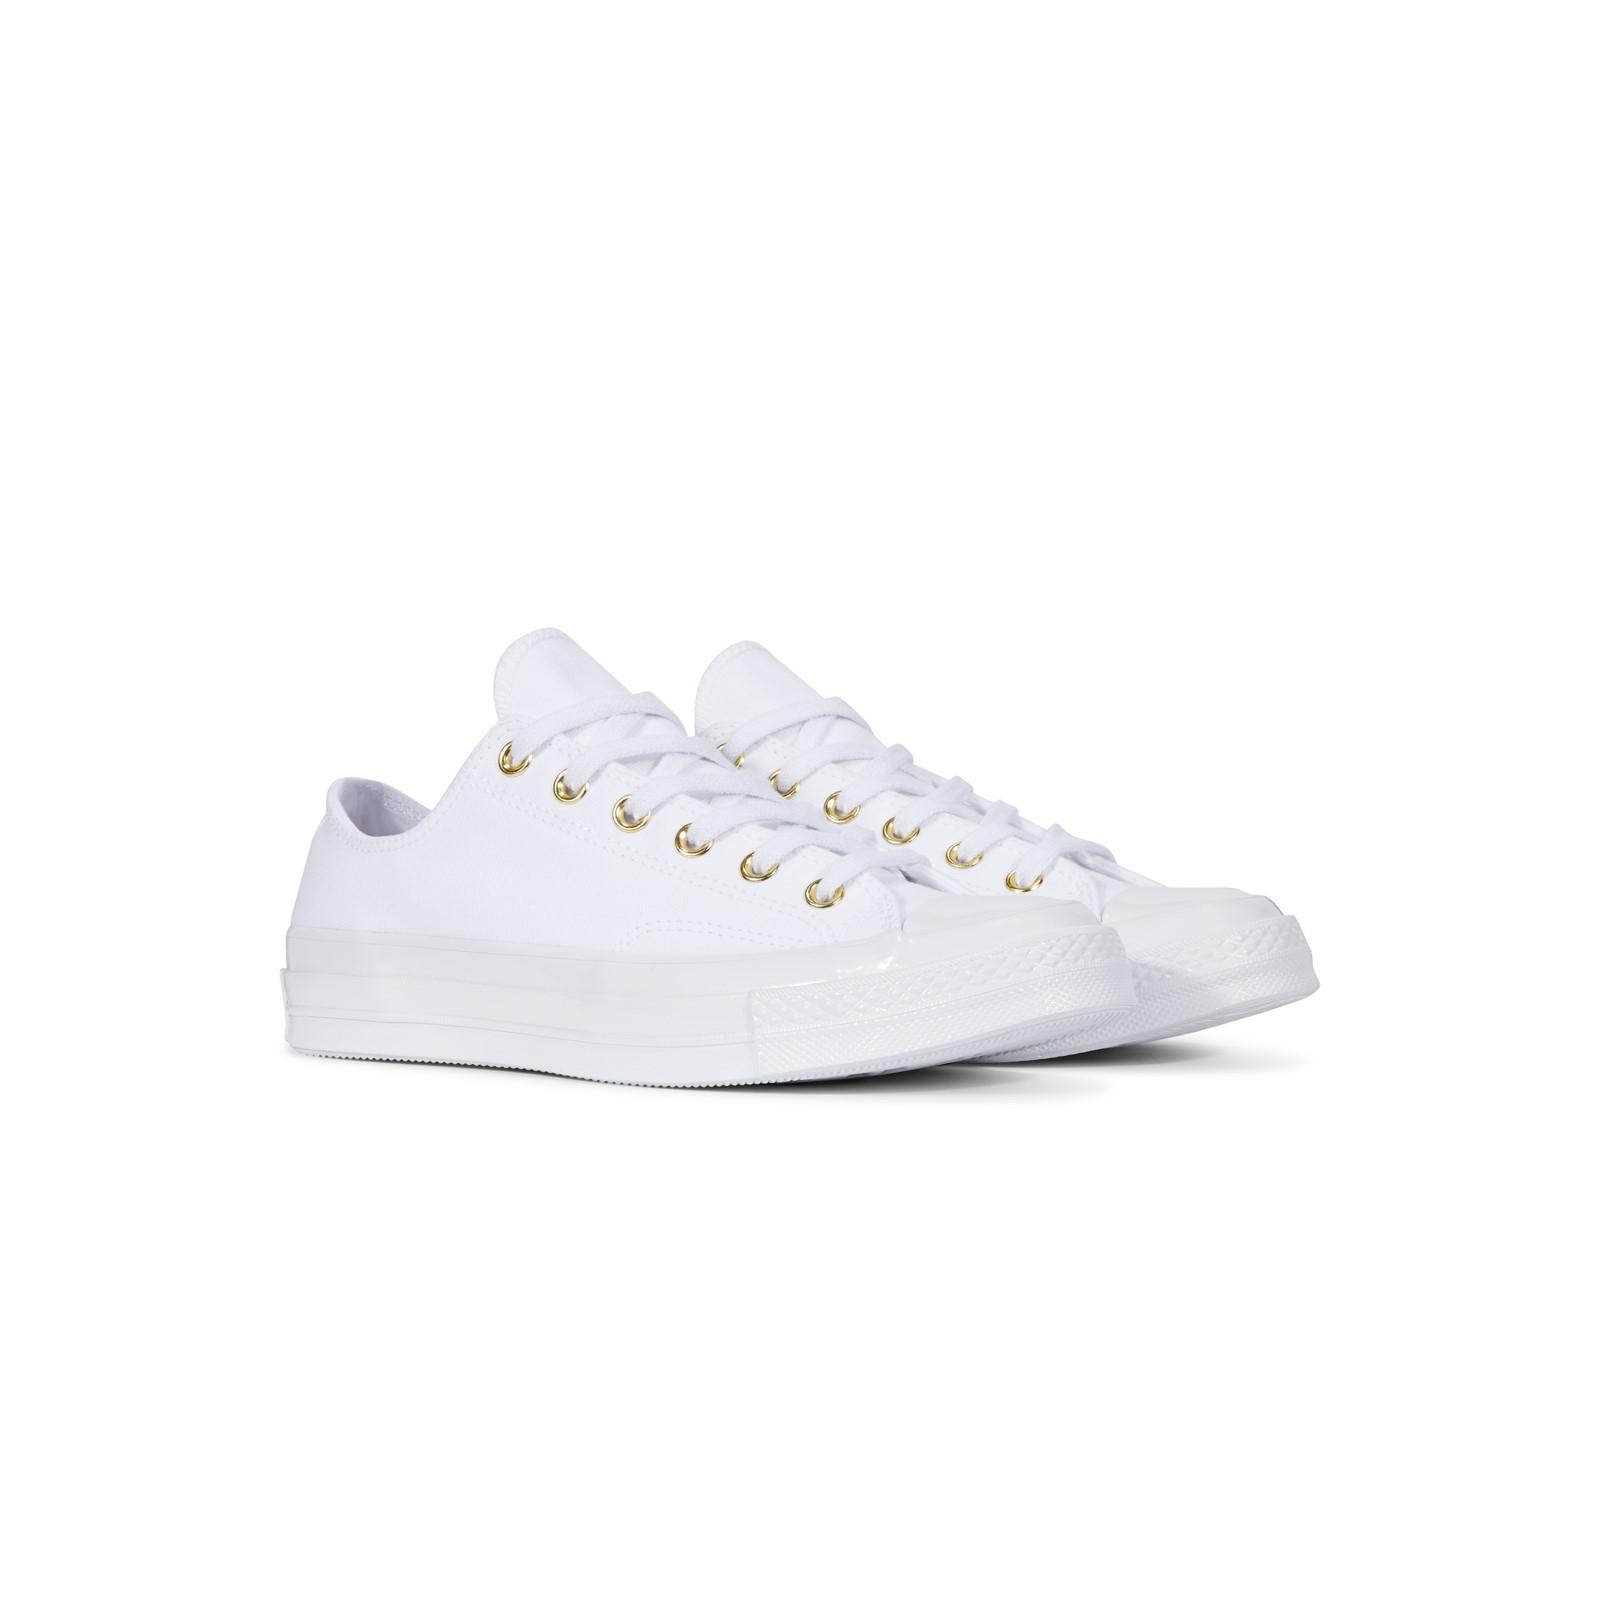 1f4fb84a6405 Converse Chuck 70 Ox - 160525c - Sneakersnstuff